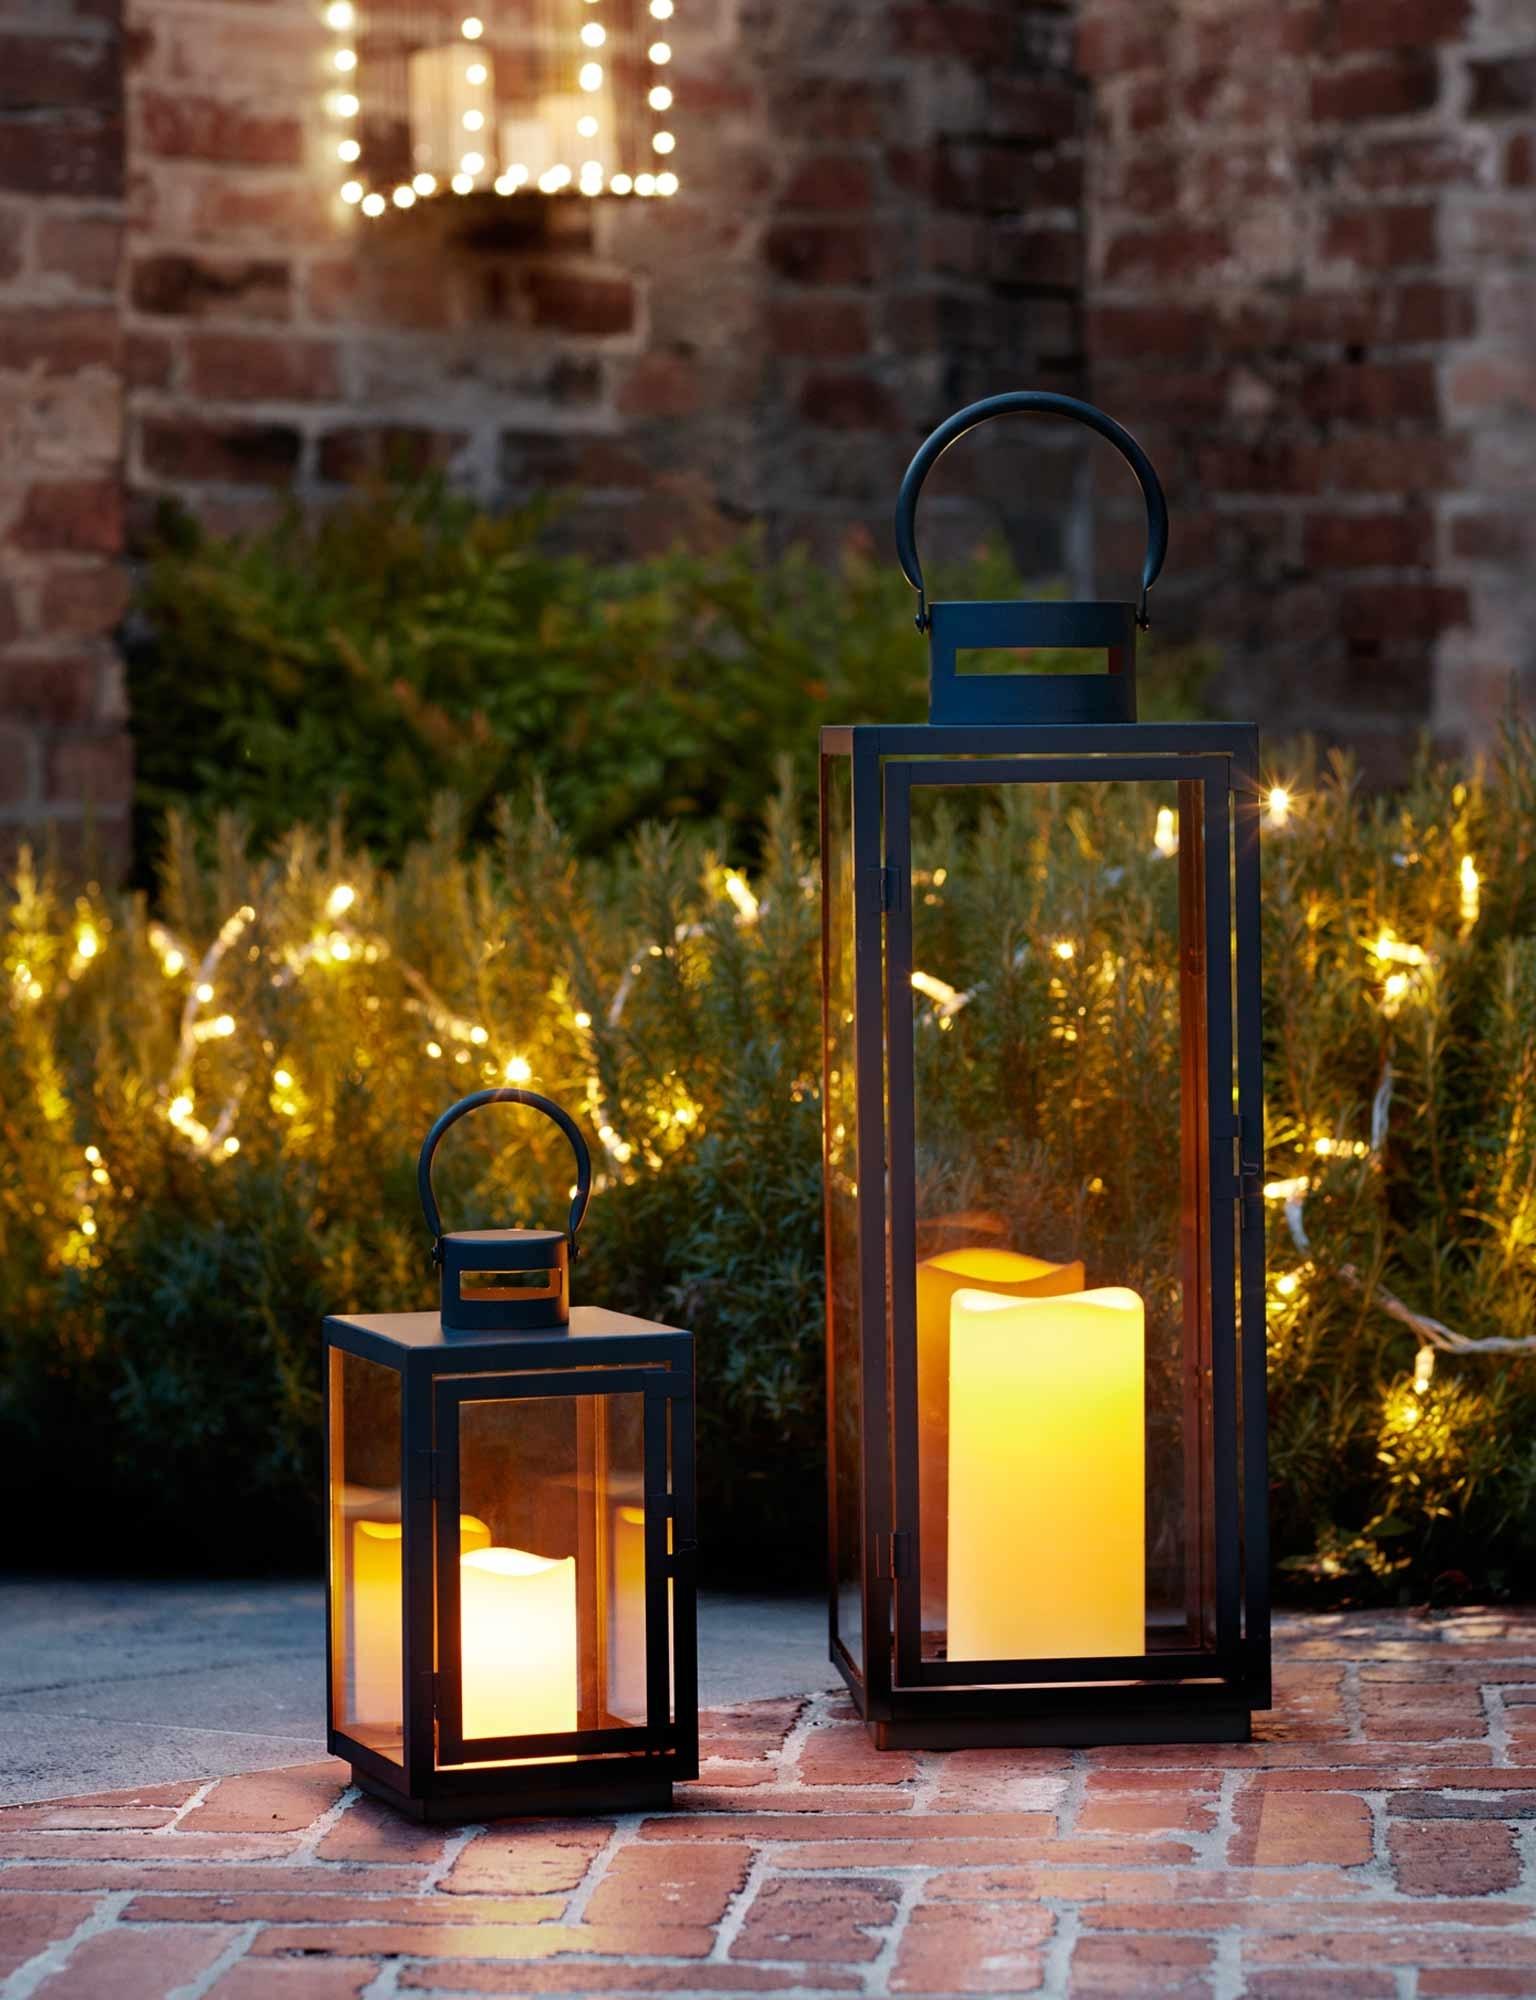 Garden Lighting Ideas | Inspiration | Lights4Fun.co.uk inside Outdoor Ground Lanterns (Image 5 of 20)